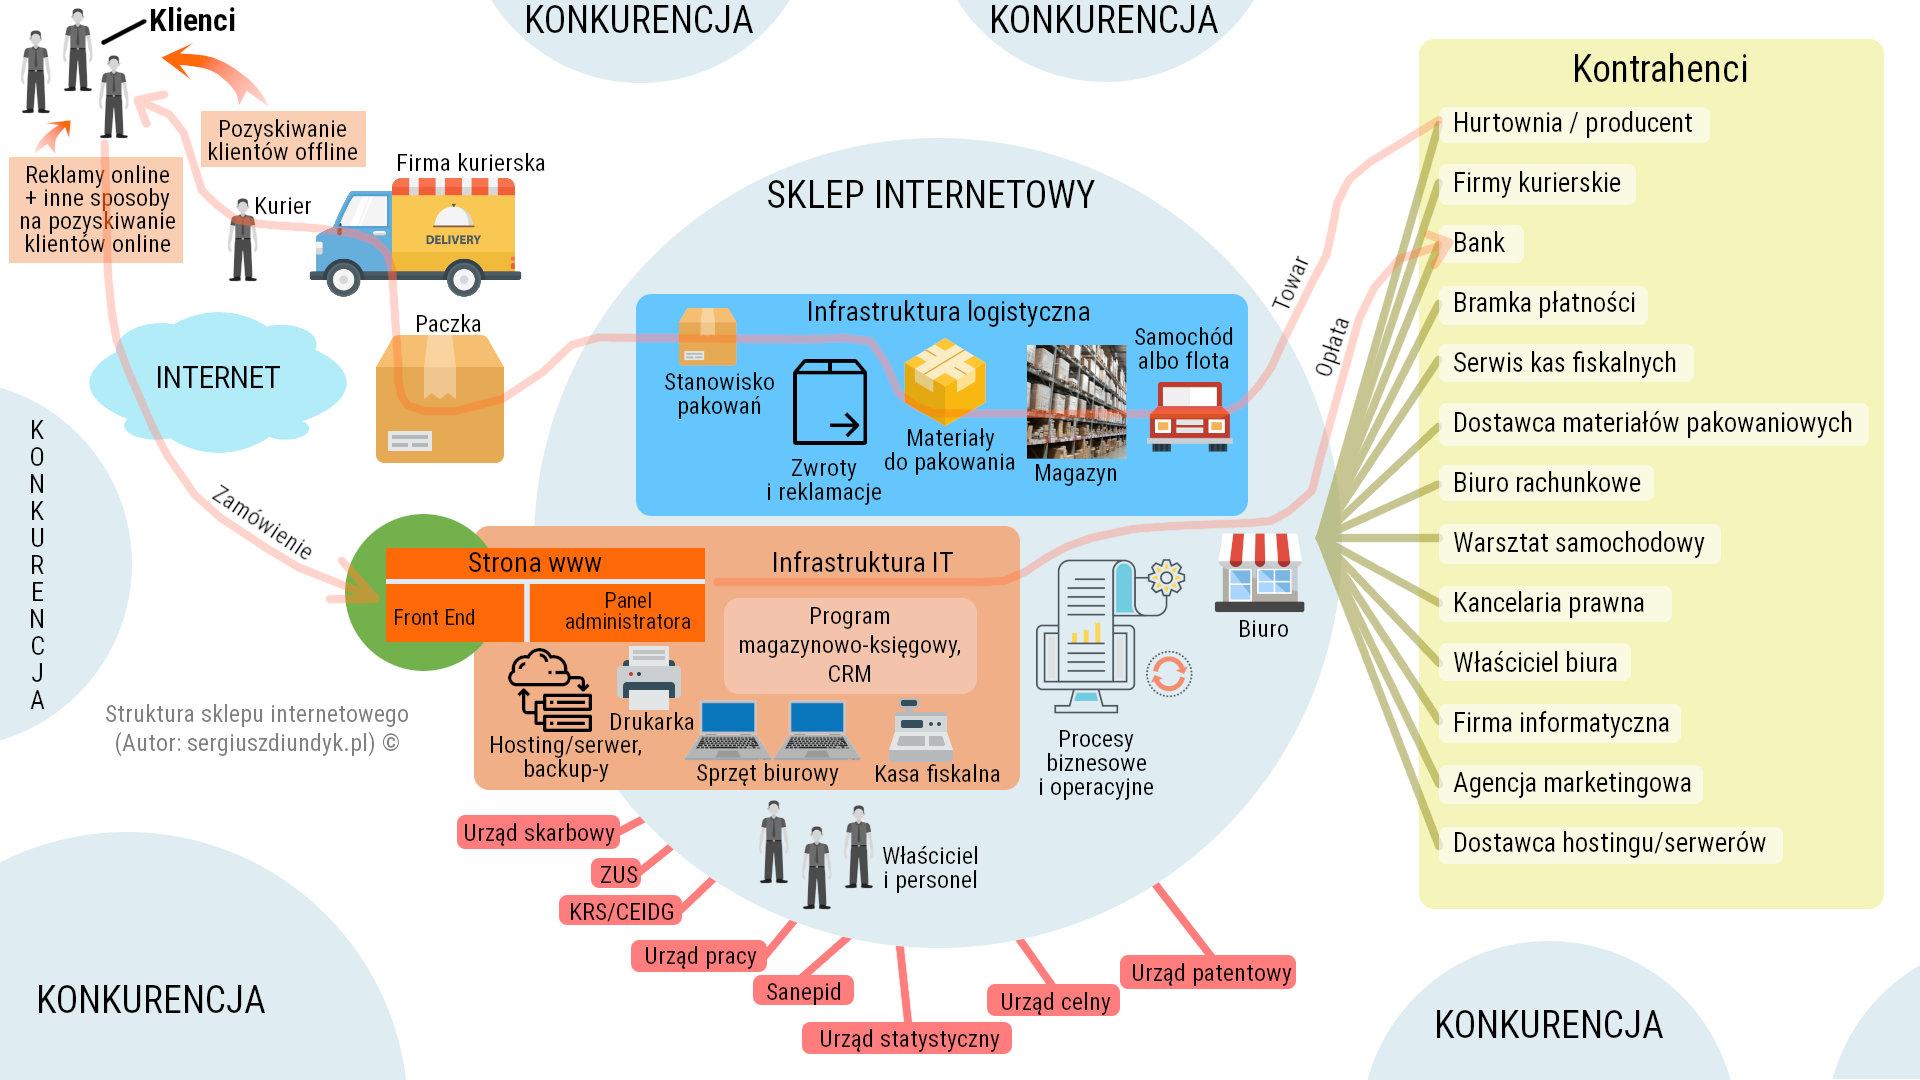 Struktura sklepu internetowego